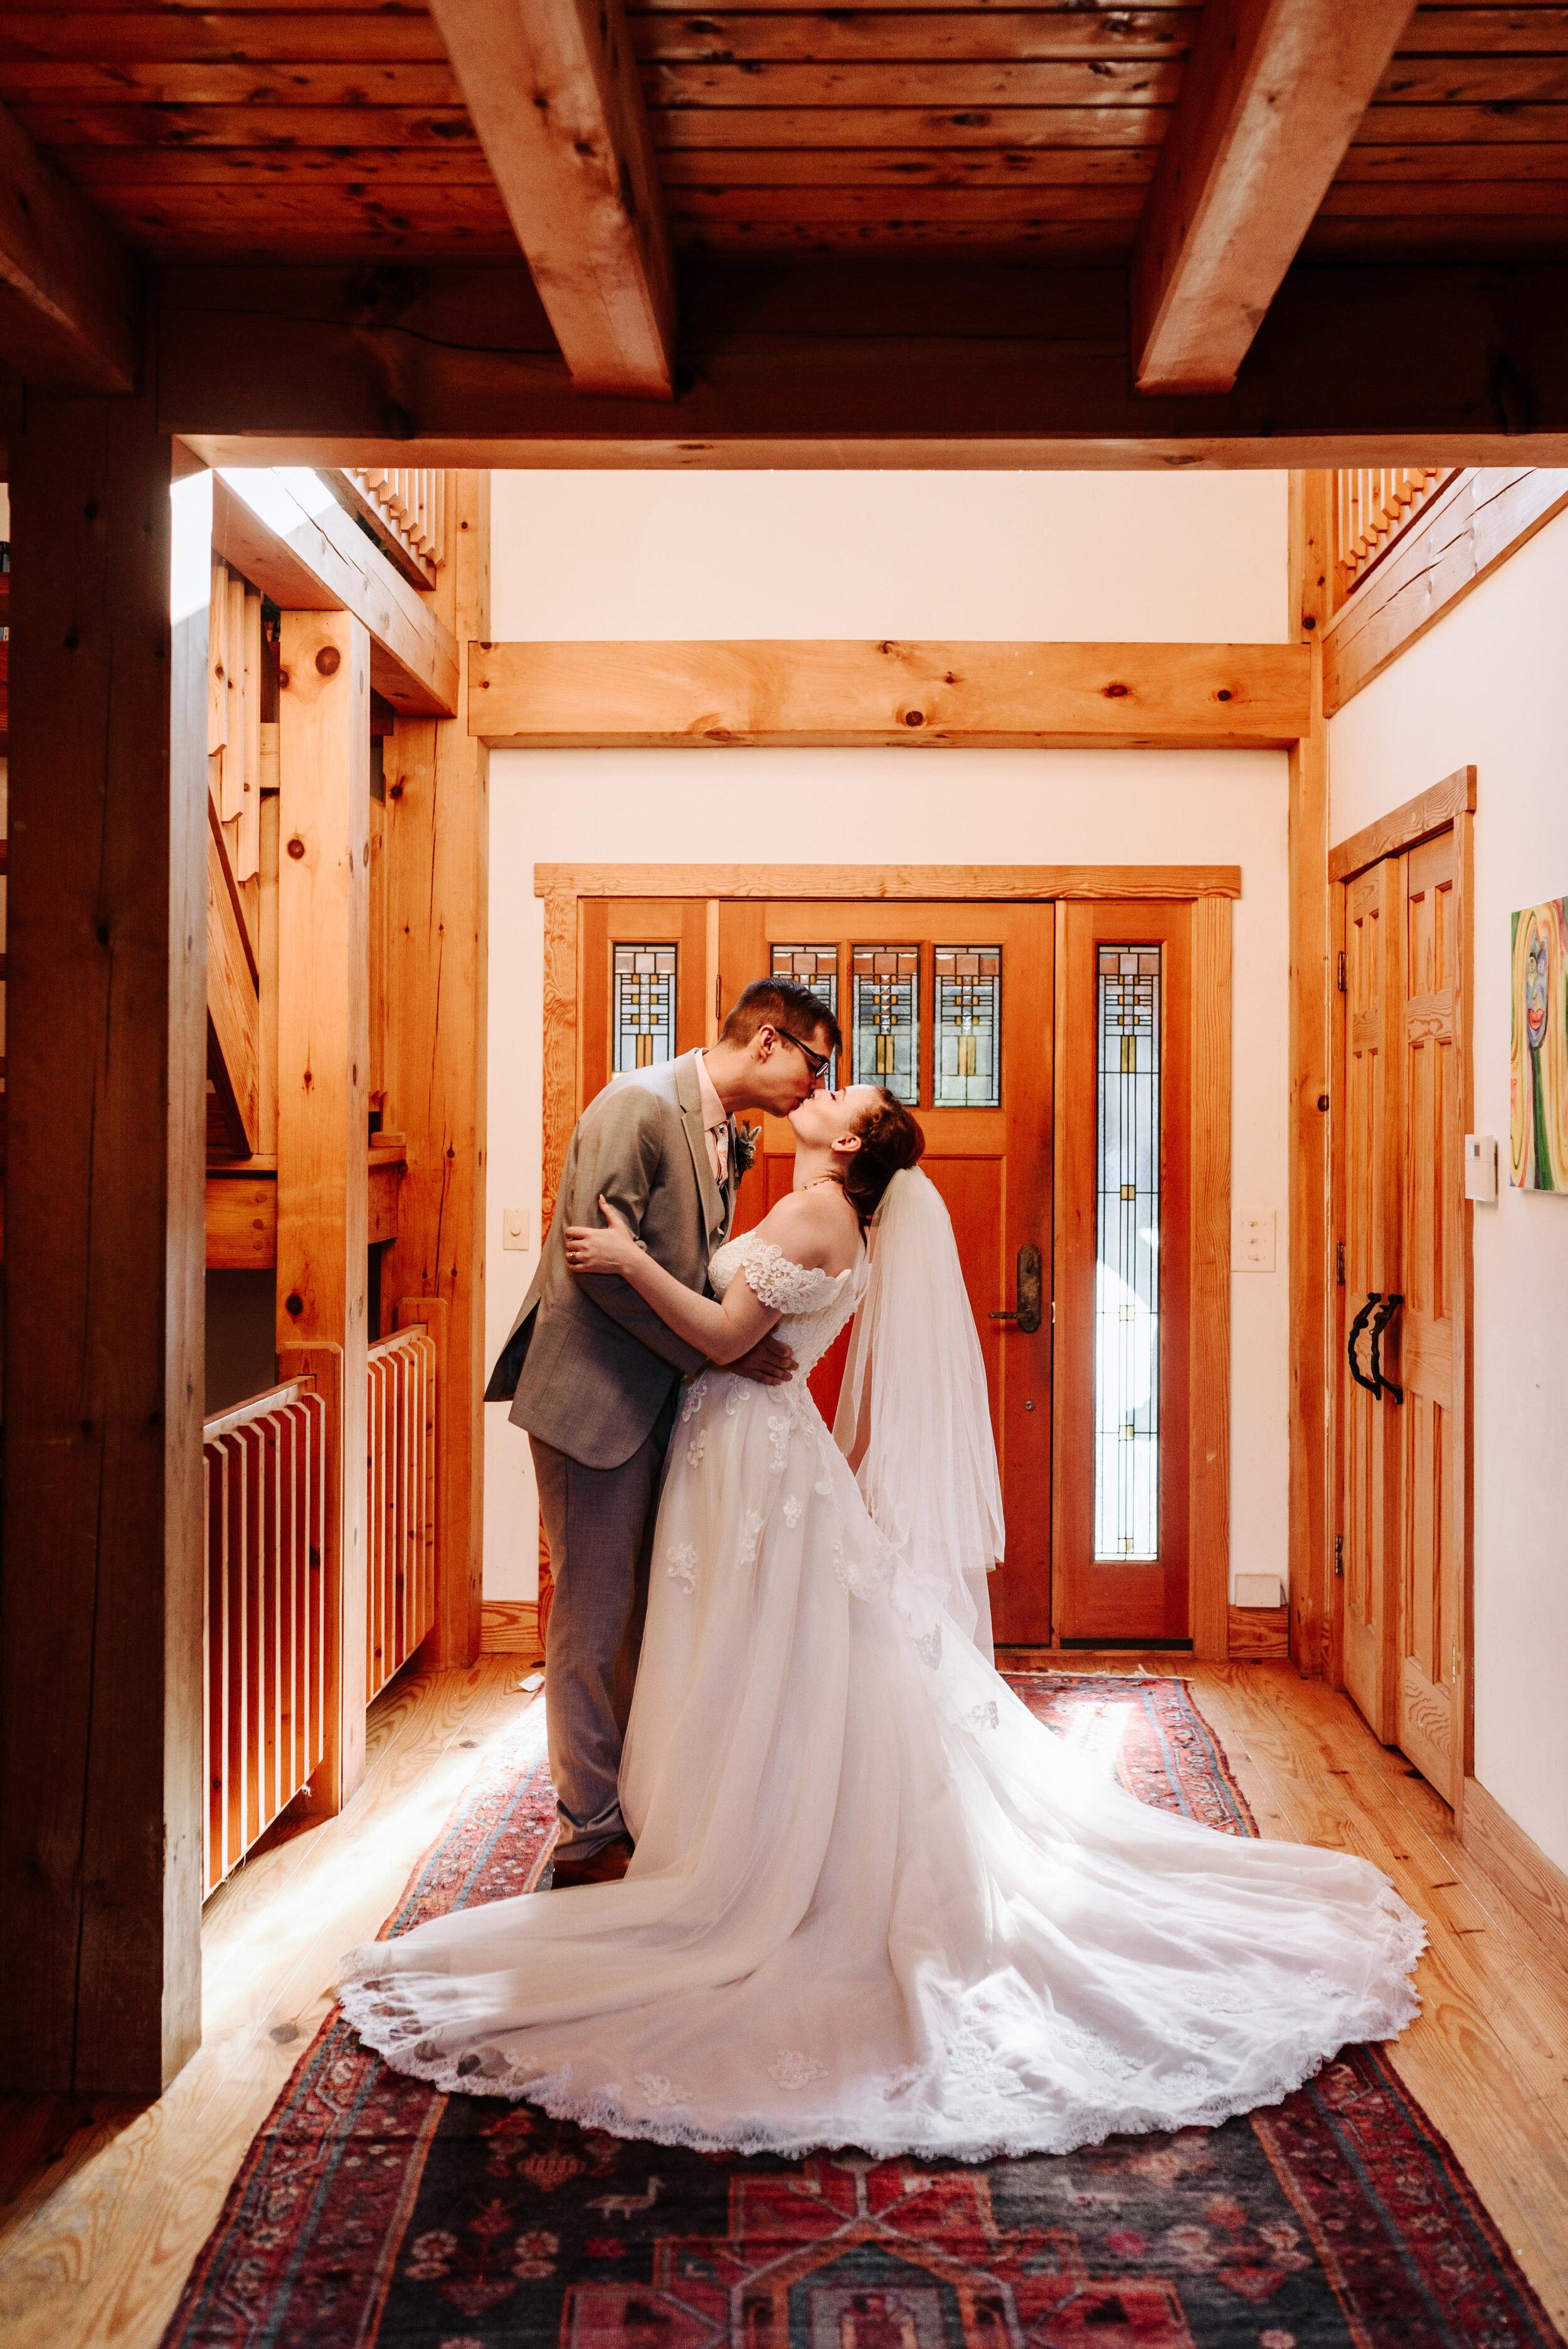 Rachel_David_Wedding_Richmond_Virginia_Photography_by_V_39.jpg